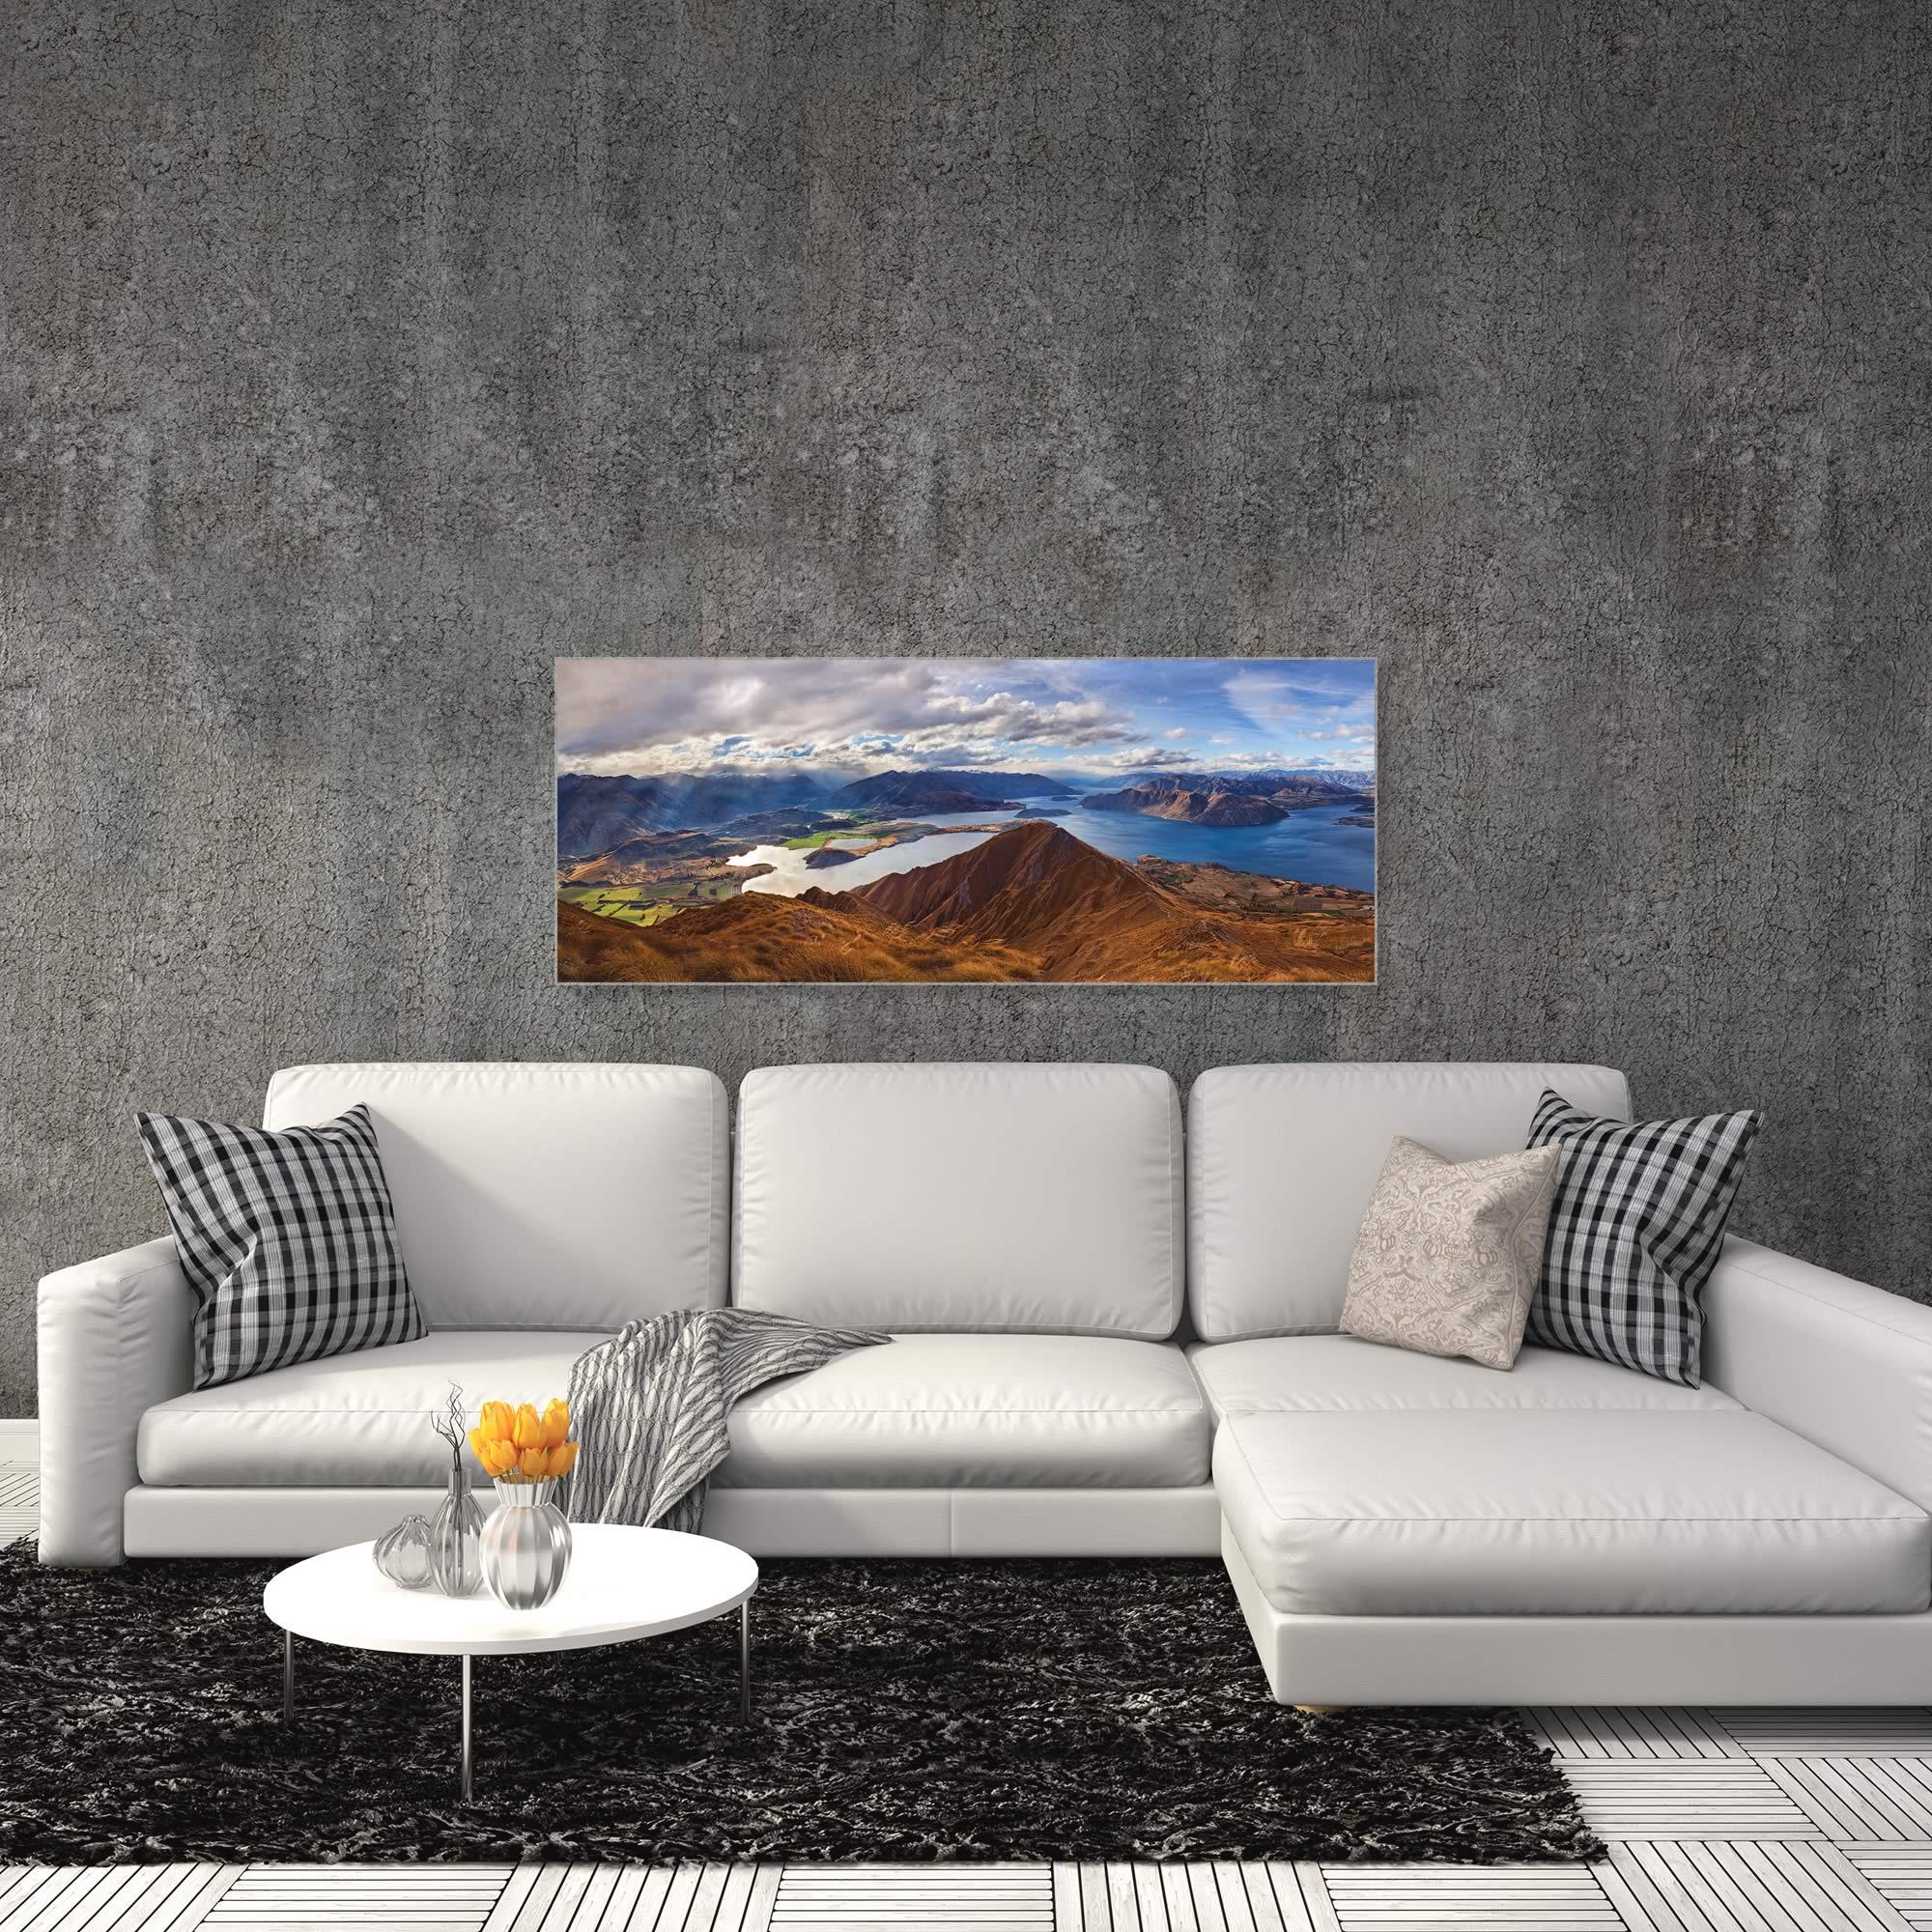 Roys Peak by Yan Zhang - Landscape Art on Metal or Acrylic - Alternate View 3